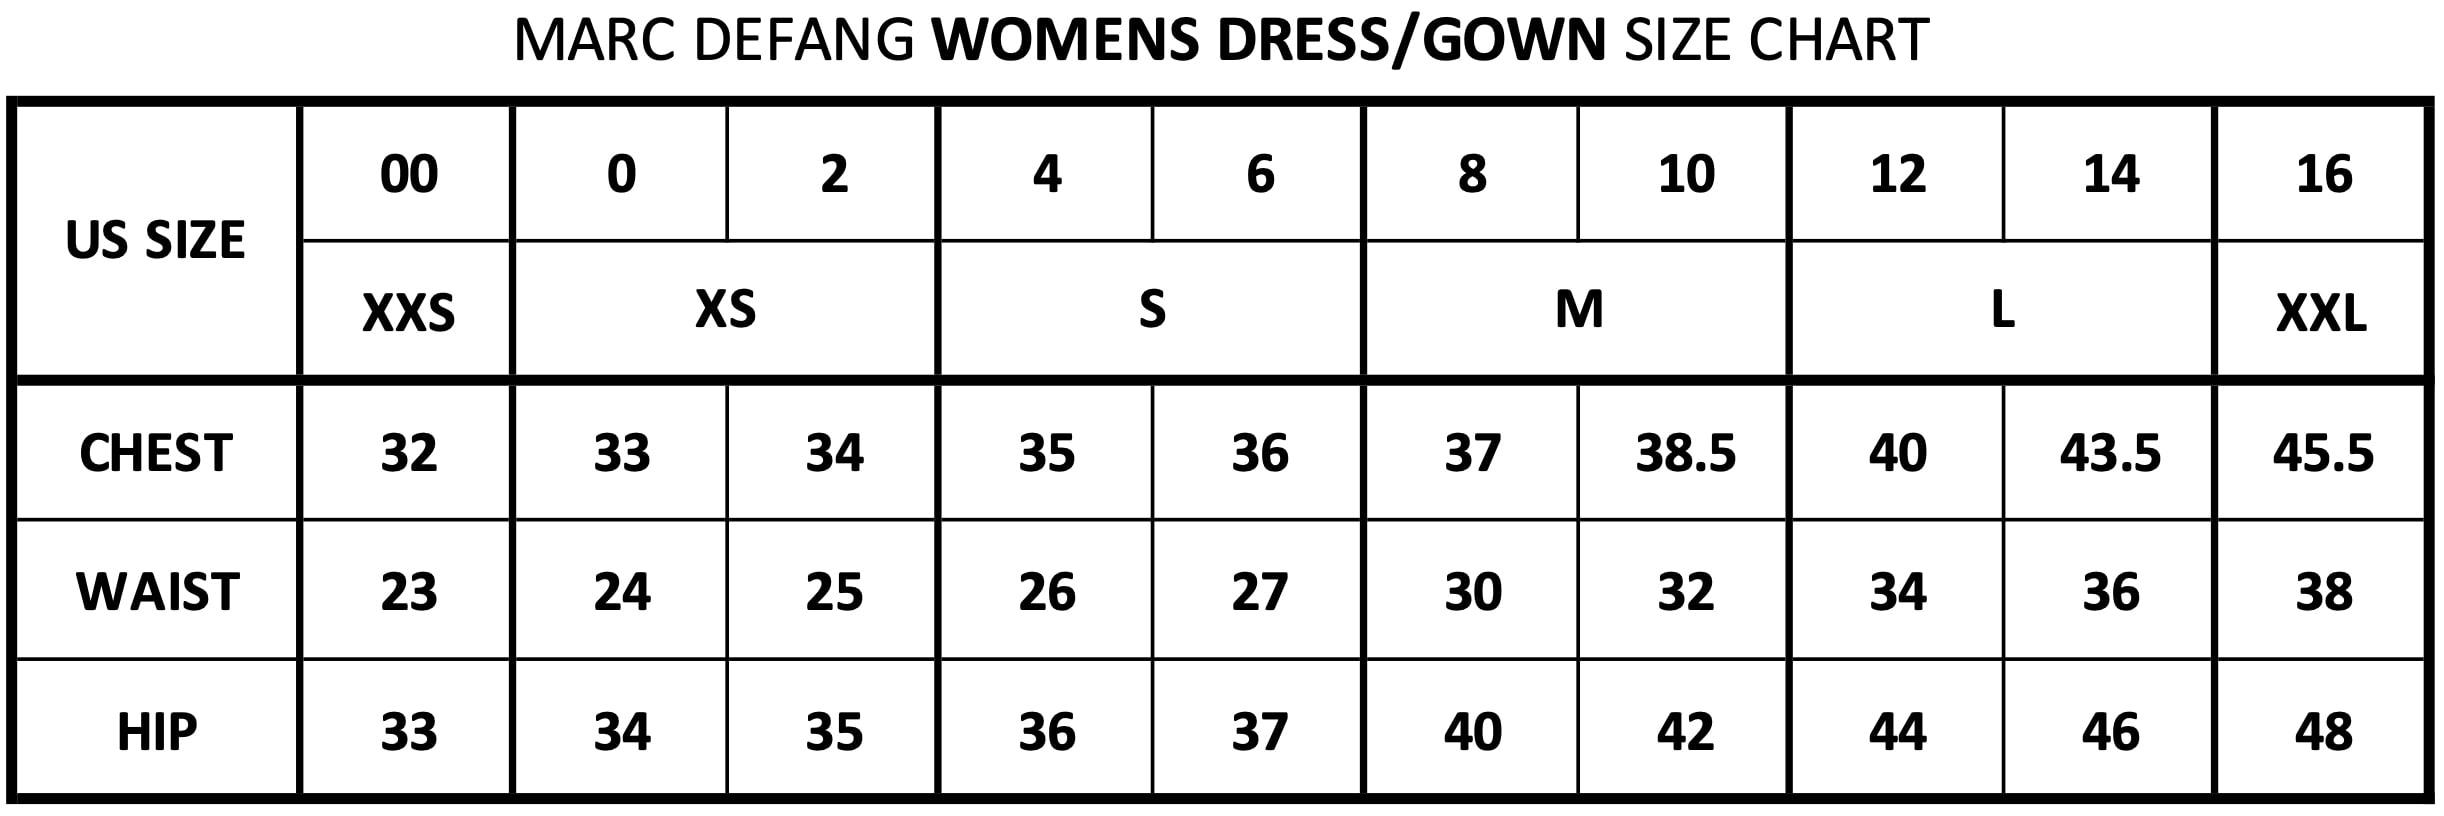 size-women-dresses-min.jpg